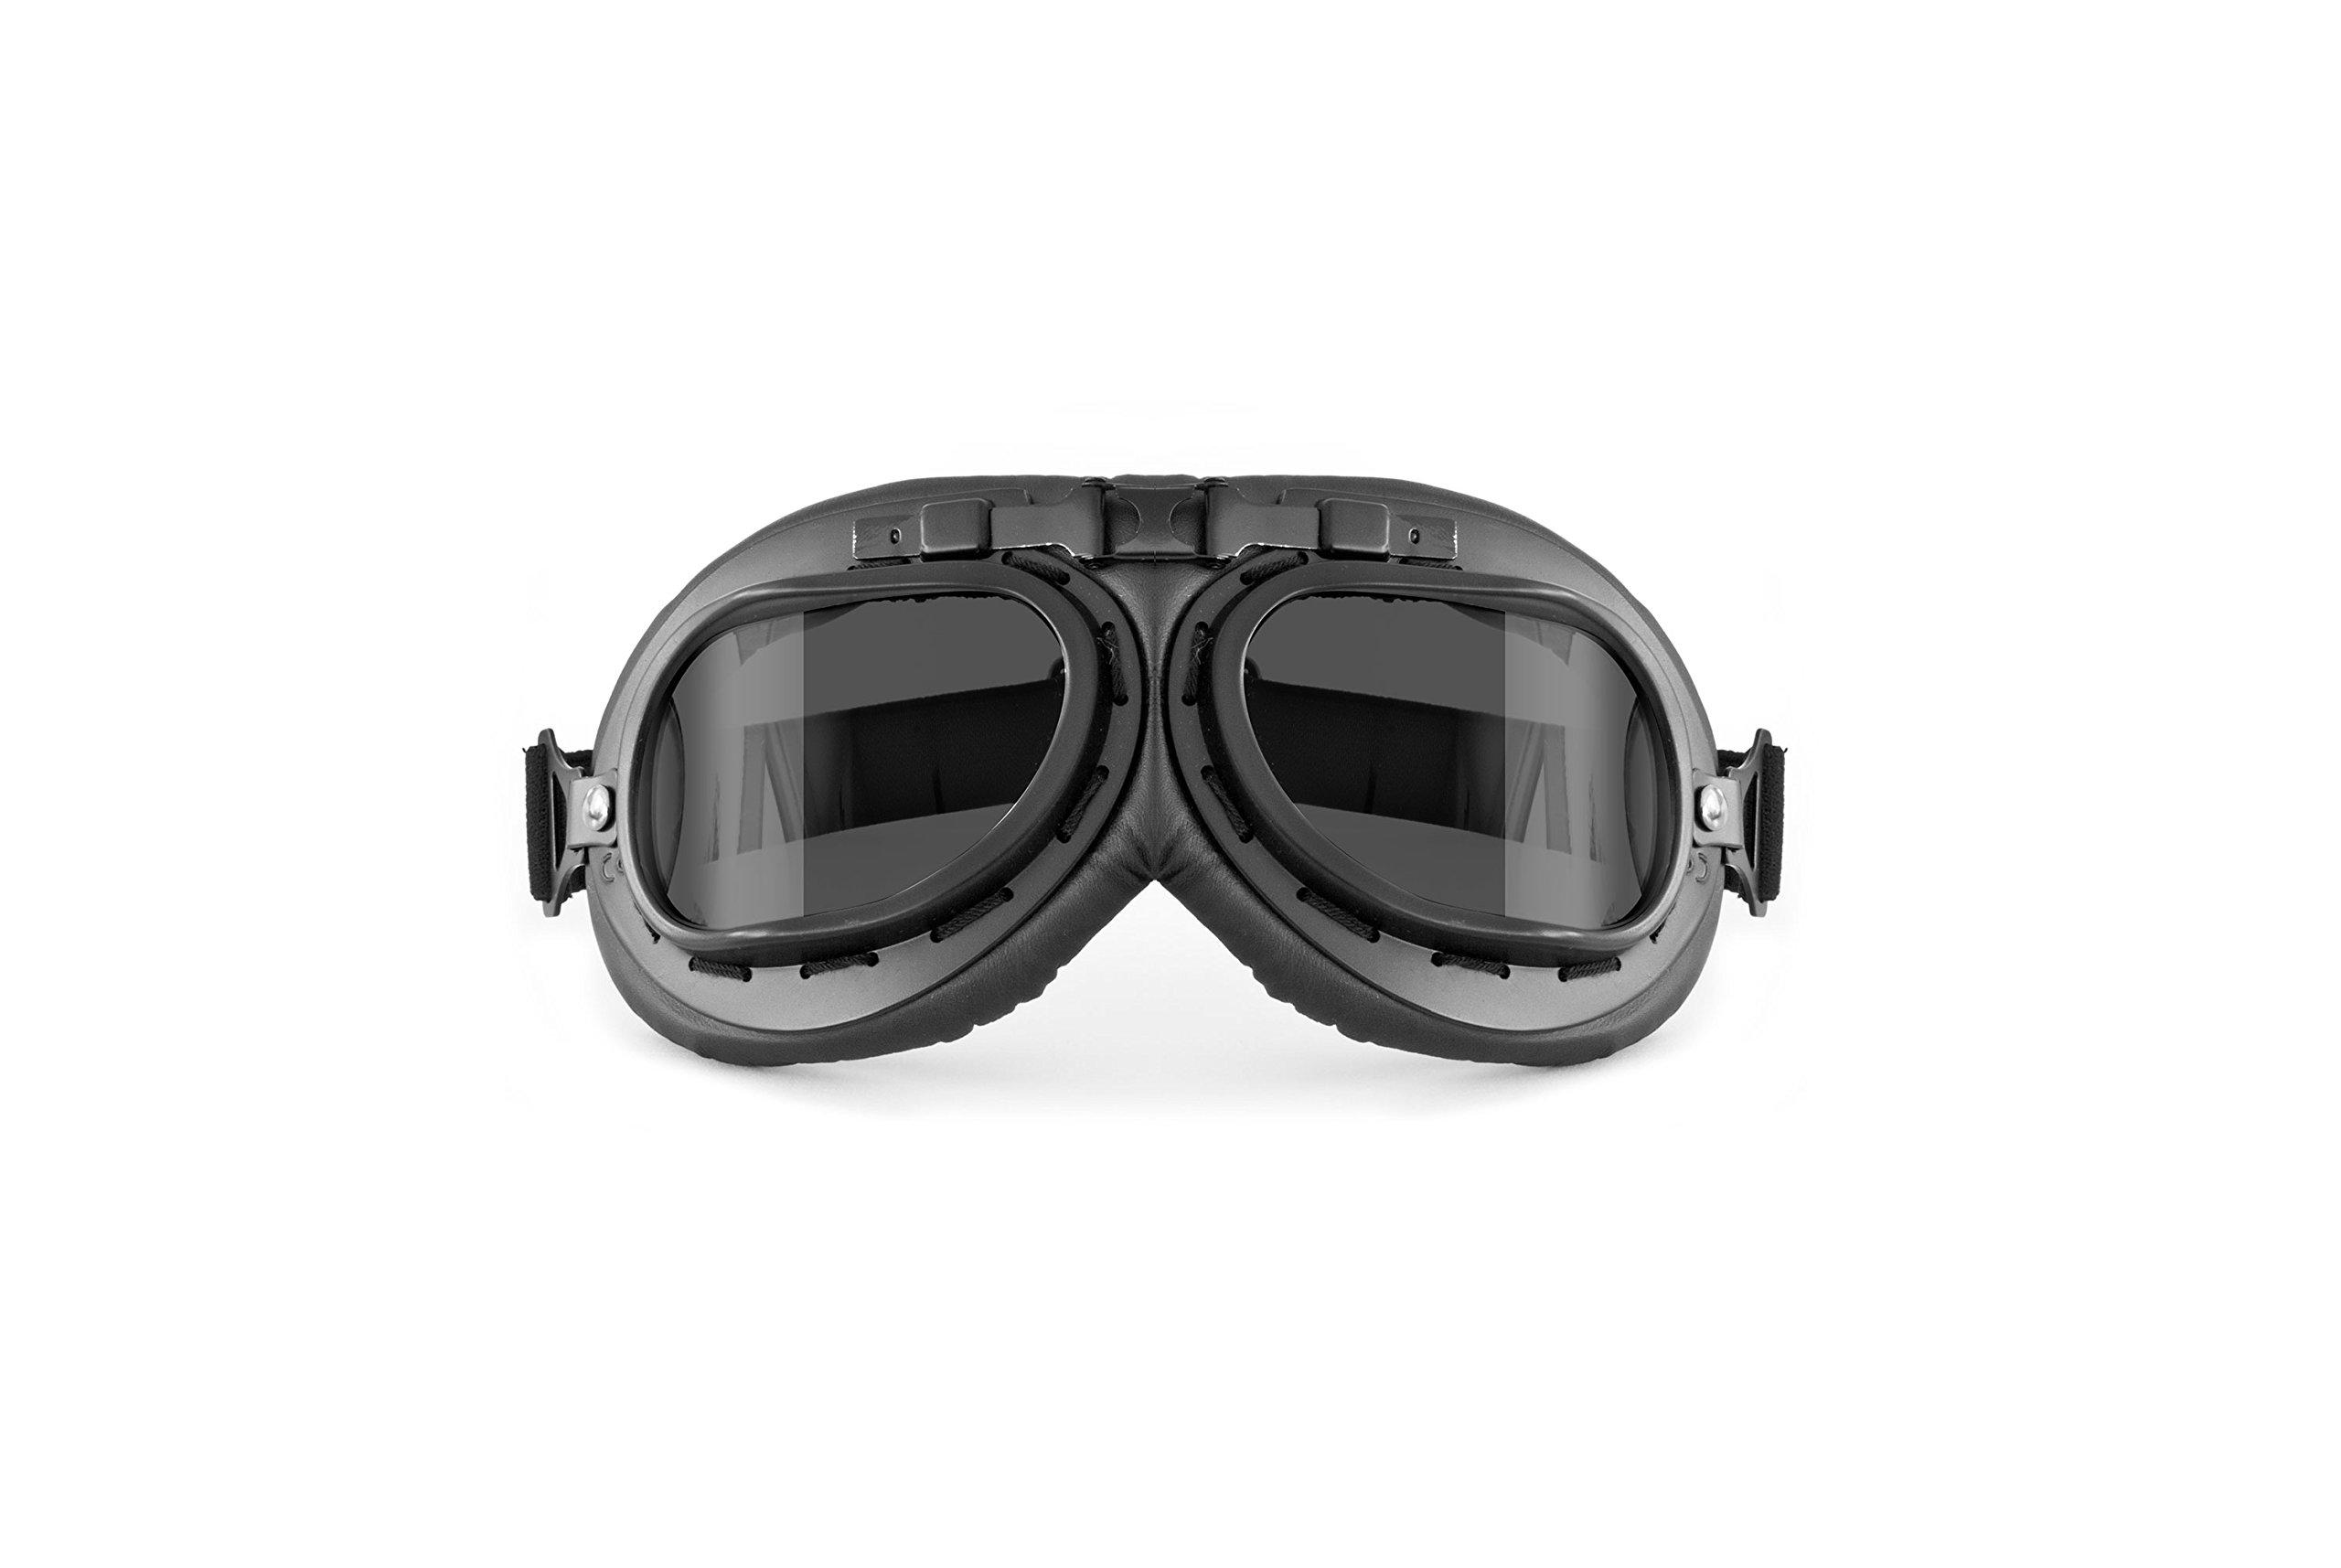 Masque moto aviateur Bertoni AF195 2